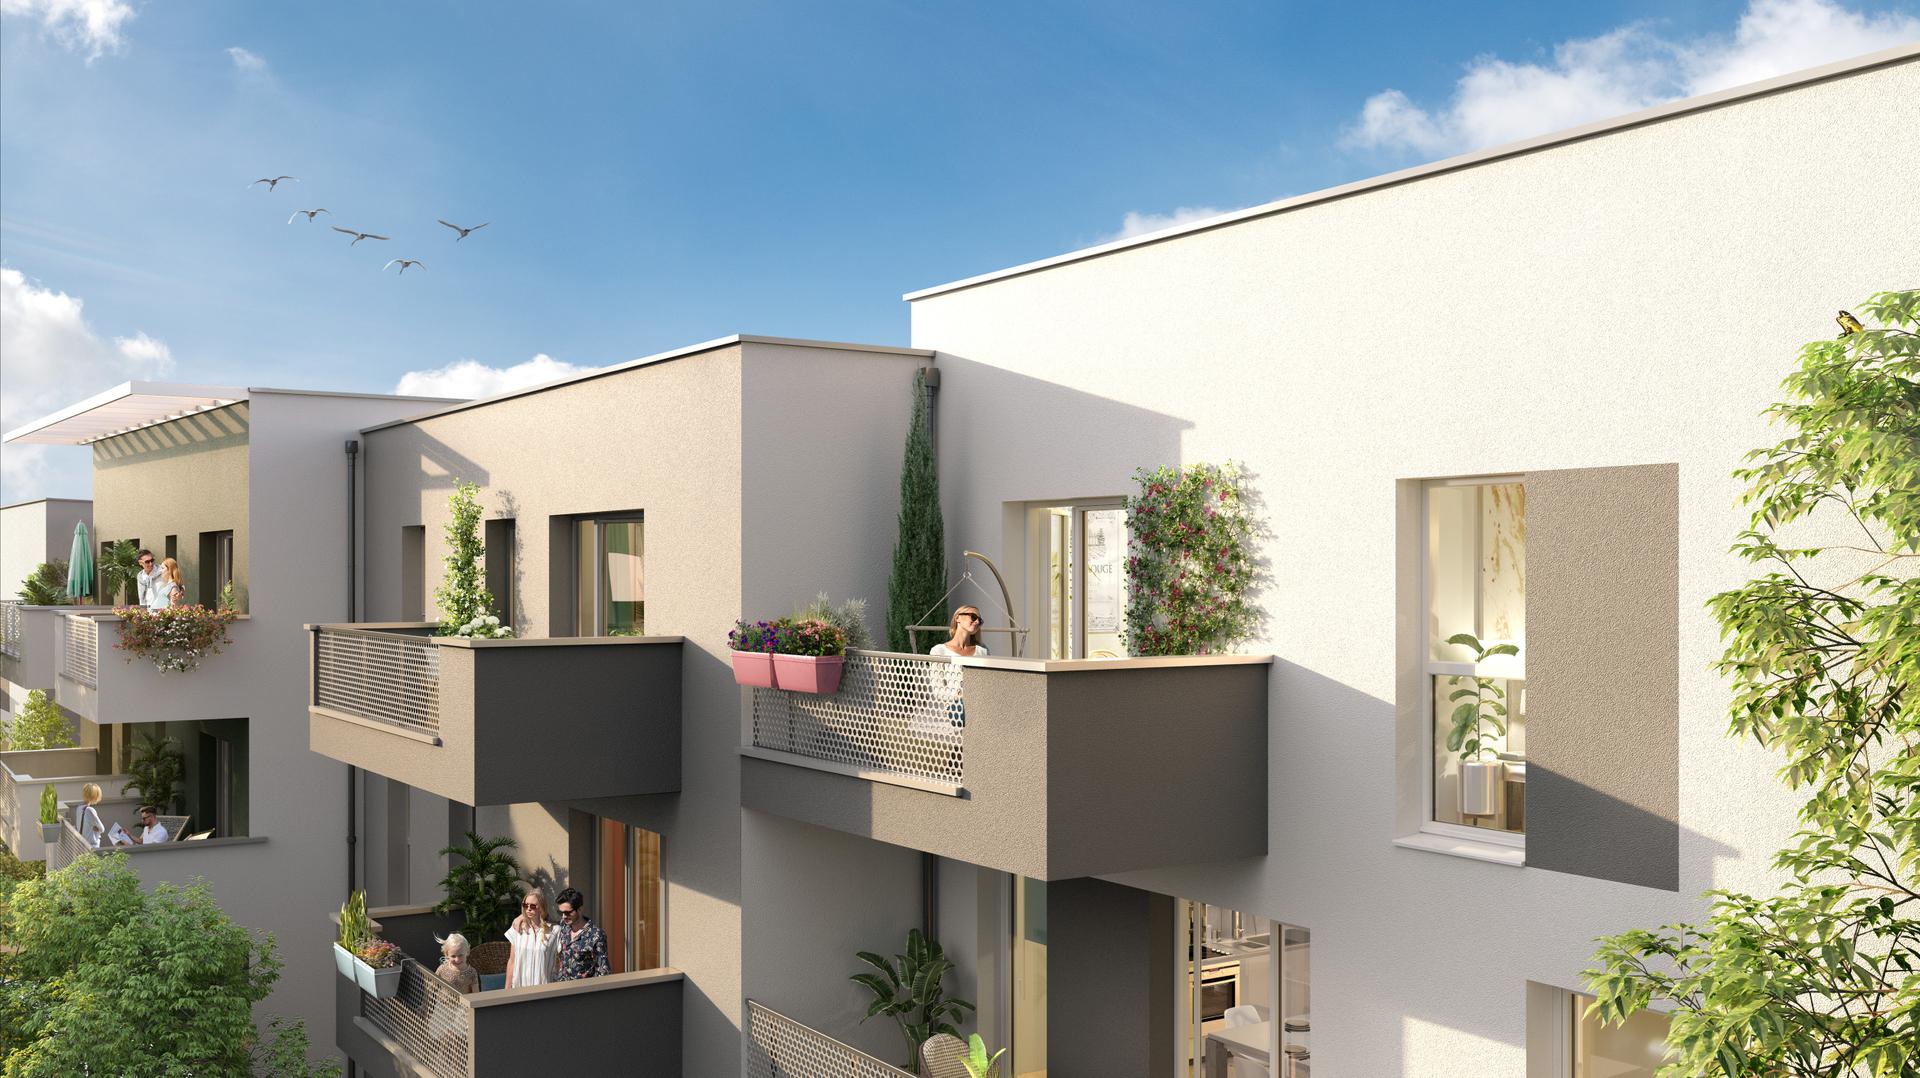 Programme immobilier neuf ROSA RESIDENZA